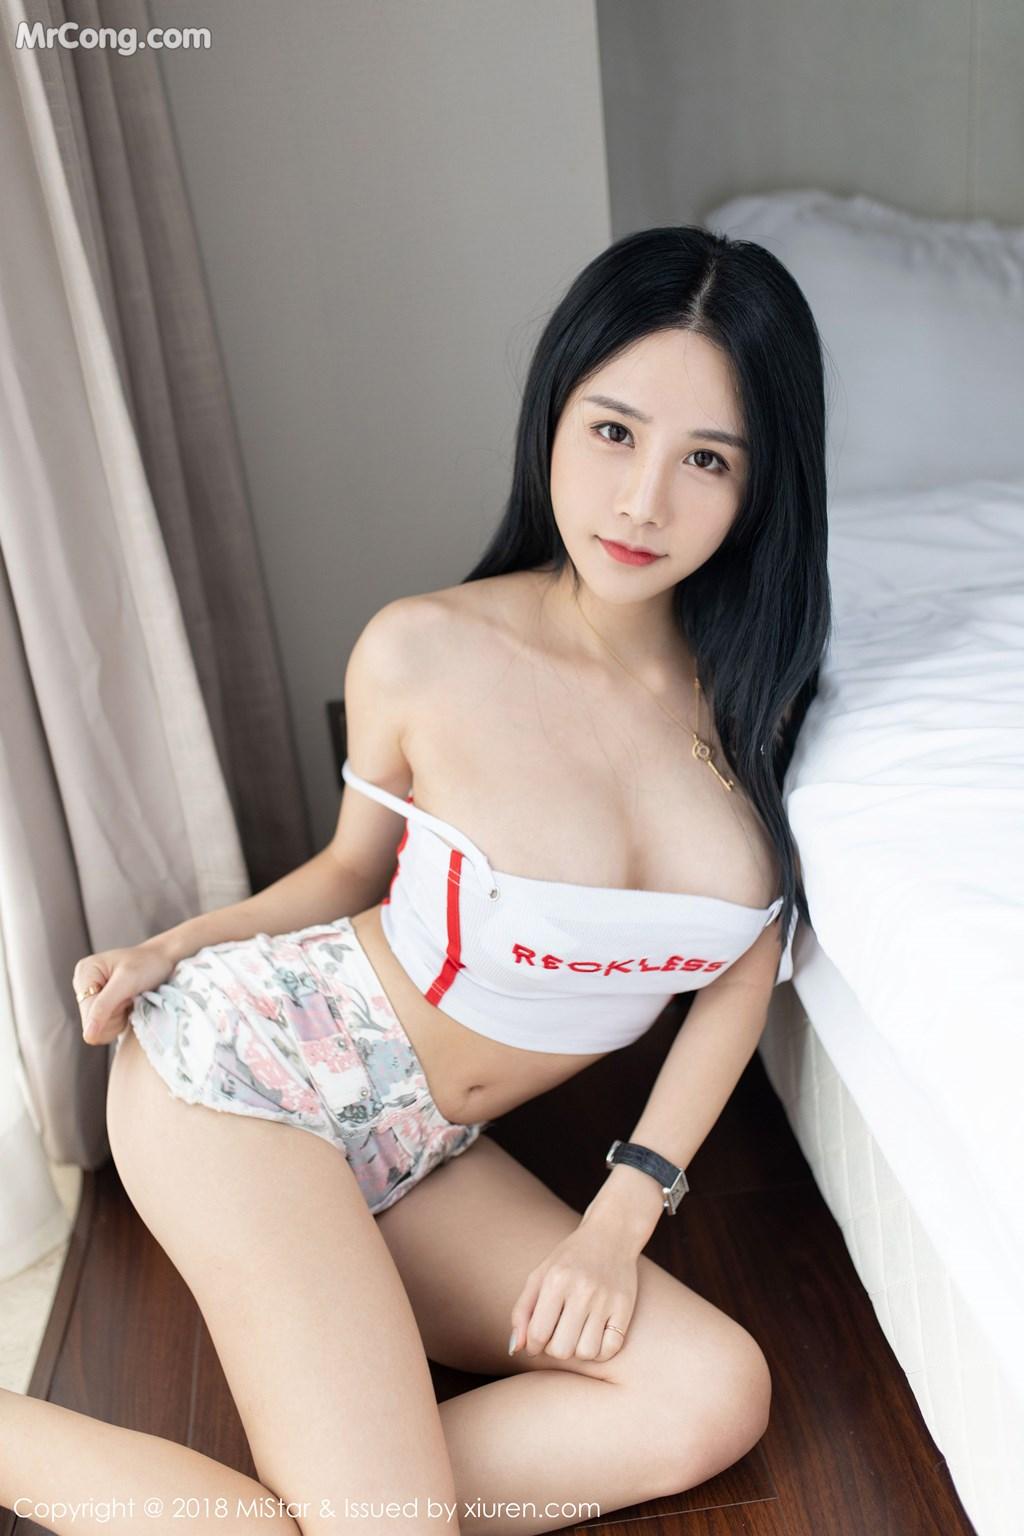 Image MiStar-Vol.248-Xiao-Mo-Lin-MrCong.com-038 in post MiStar Vol.248: Người mẫu Xiao Mo Lin (小沫琳) (44 ảnh)